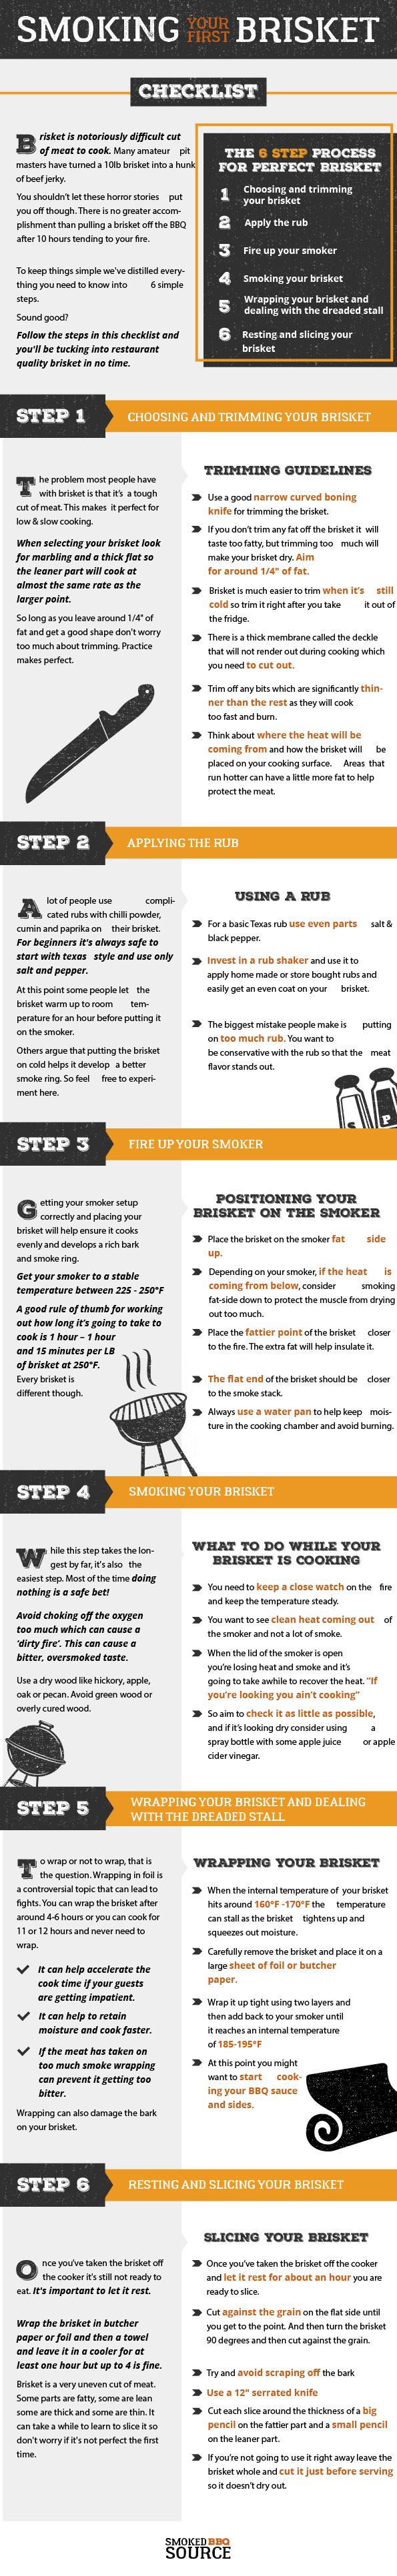 How Long To Smoke A Brisket